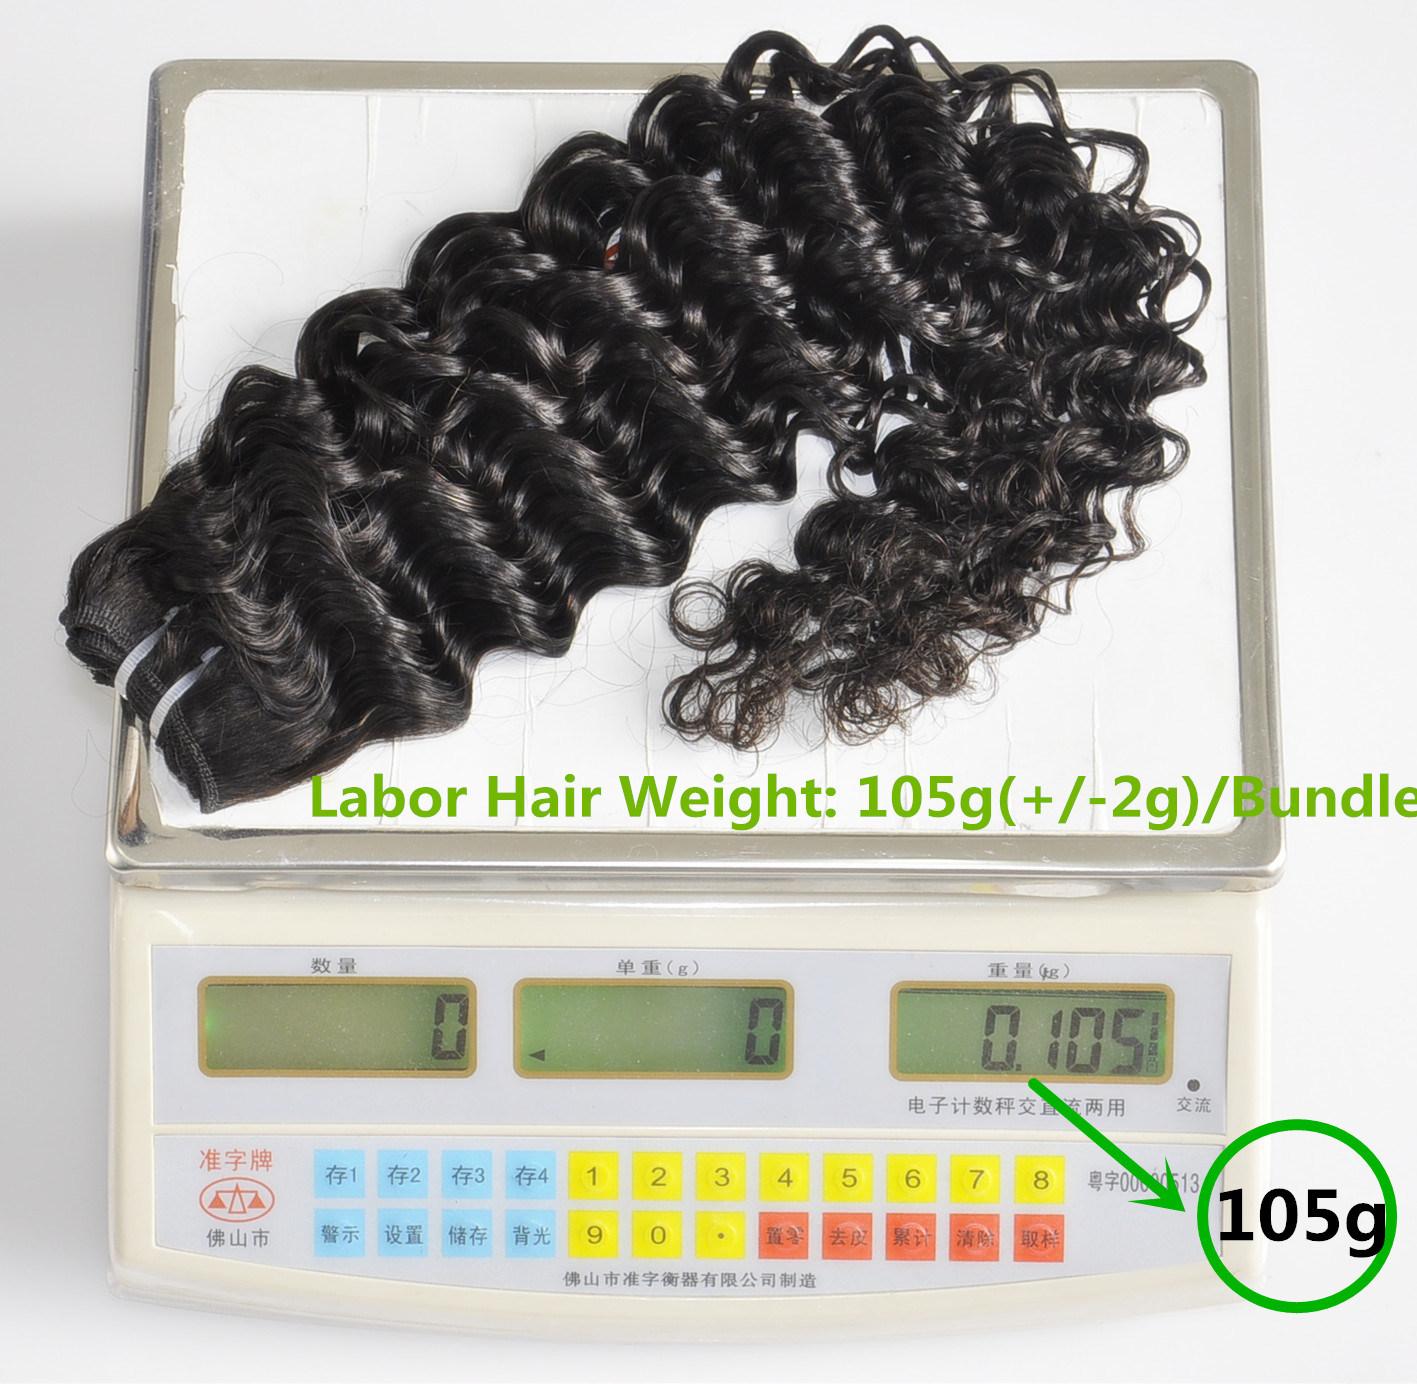 Unprocessed Labor Hair Extension 105g (+/-2g) /Bundle Natural Brazilian Virgin Hair Deep Curly 100% Human Hair Weaves Grade 8A